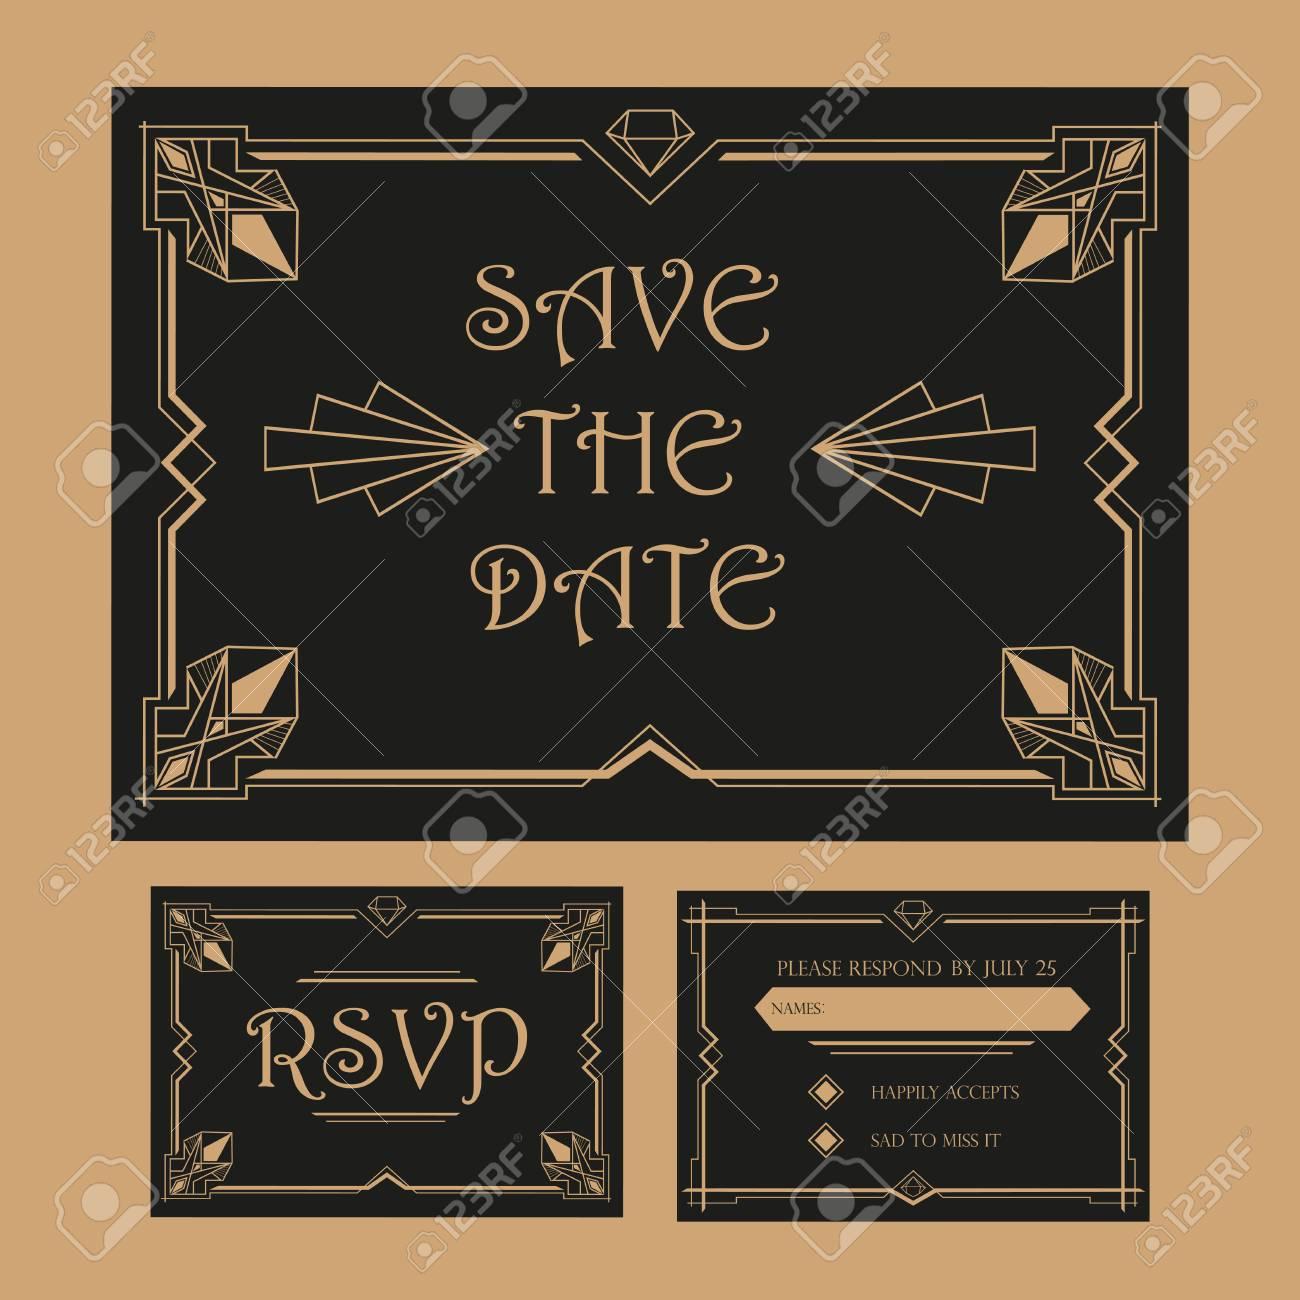 save the date wedding invitation card rsvp art deco vintage